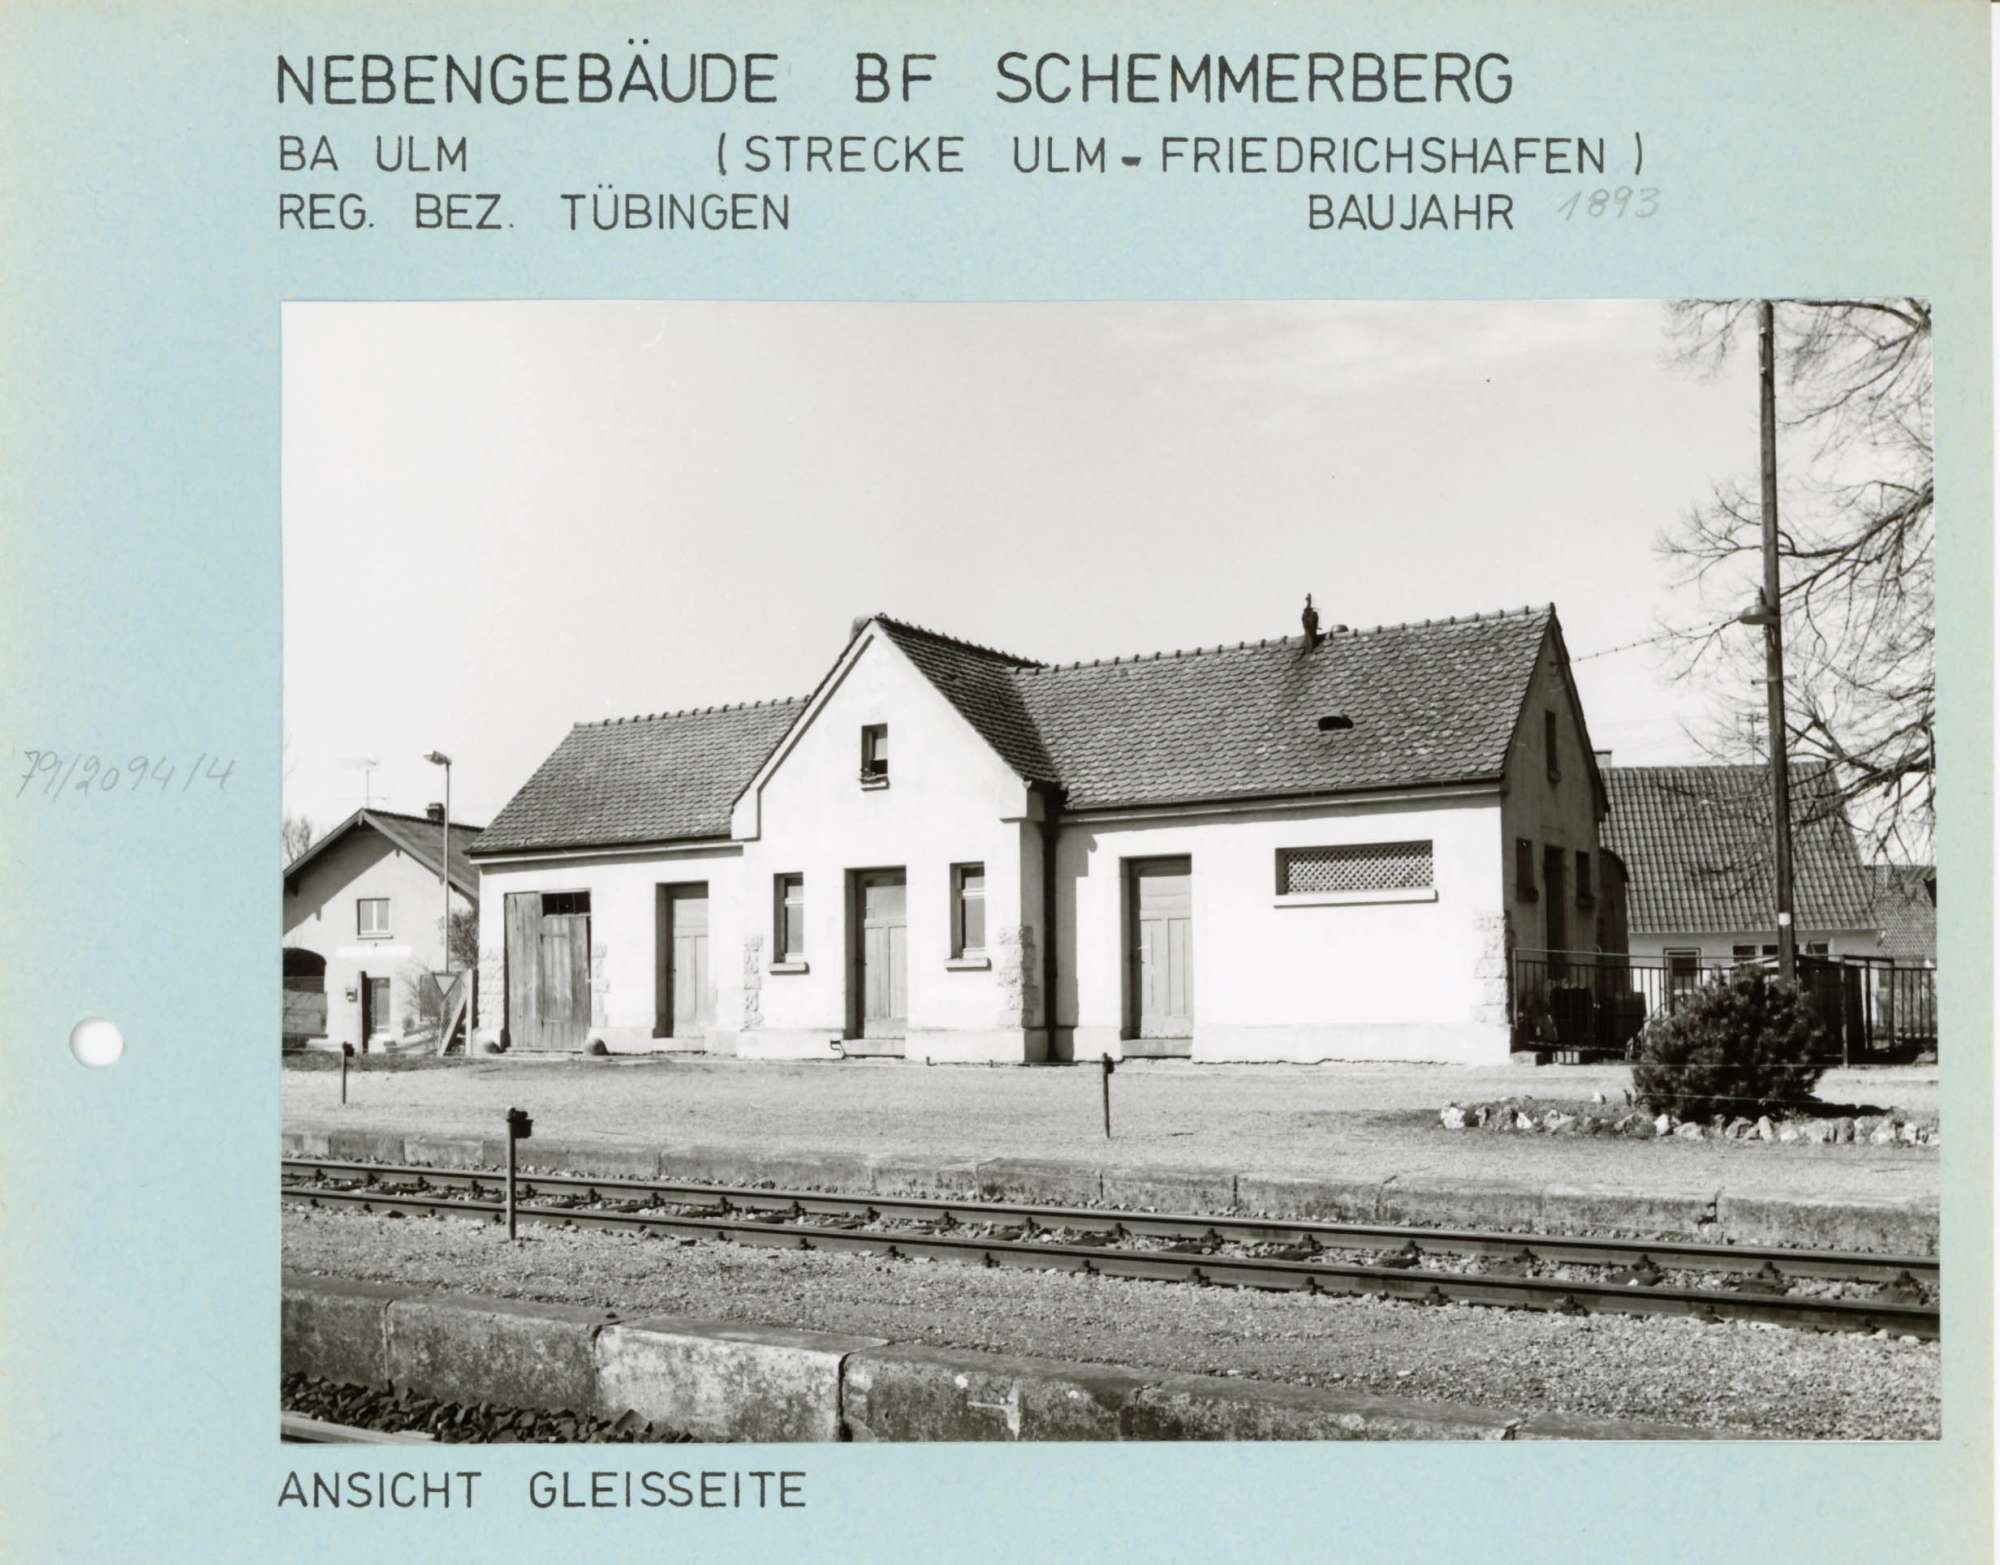 Schemmerberg: 6 Fotos, Bild 1